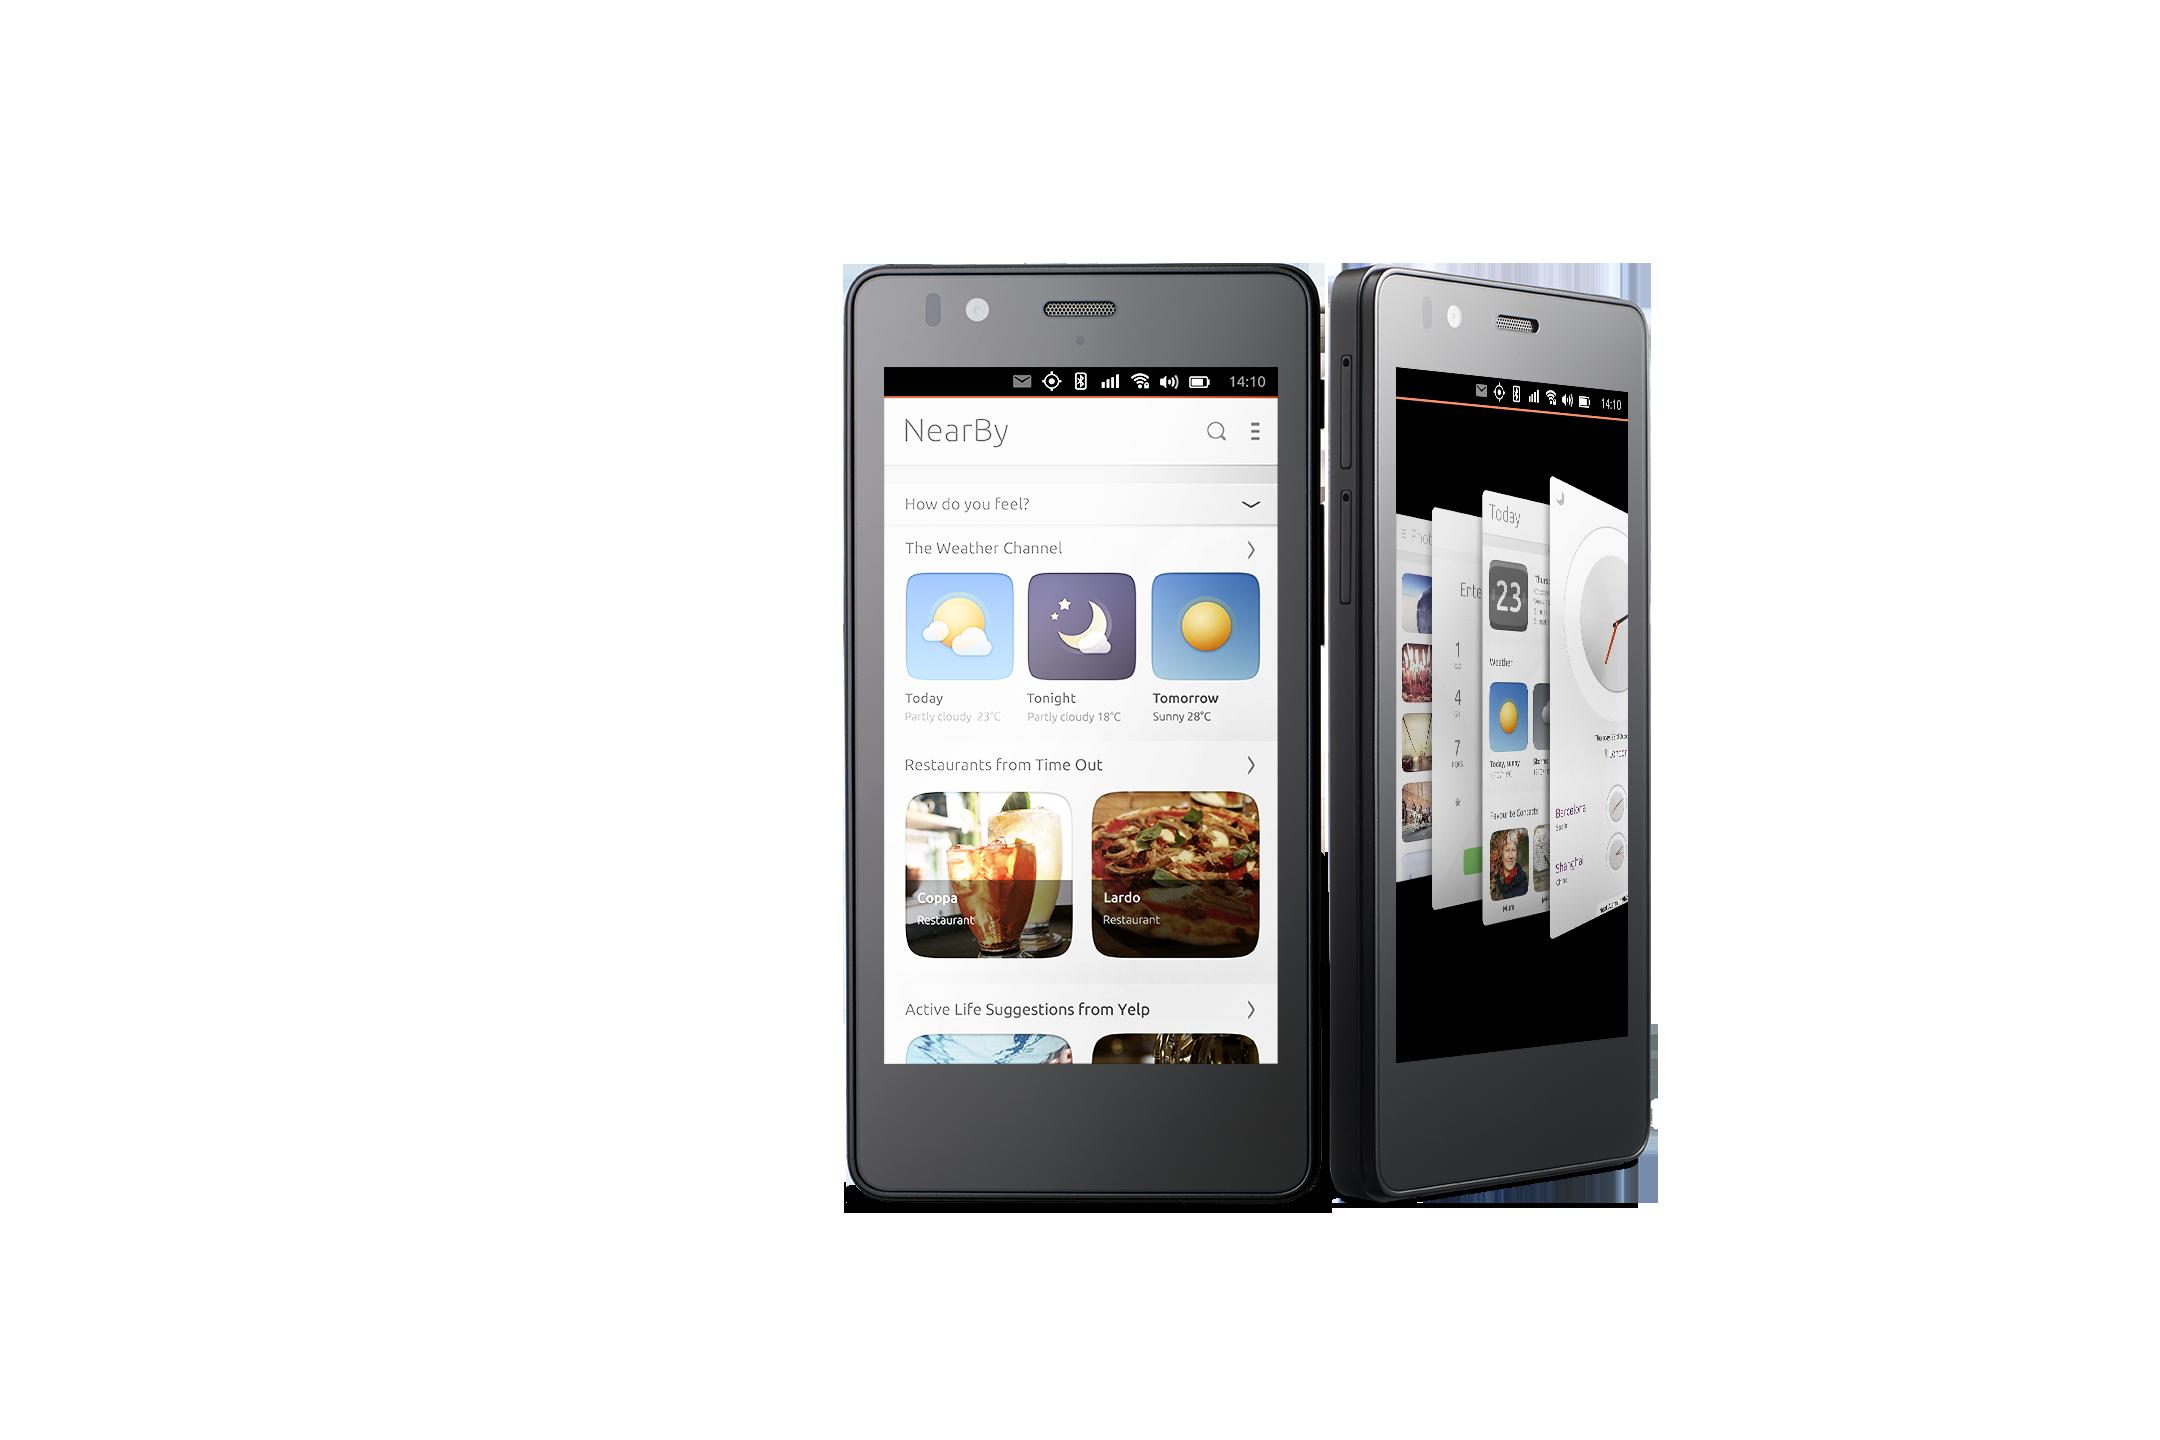 Il primo smartphone con Linux Ubuntu - Photogallery